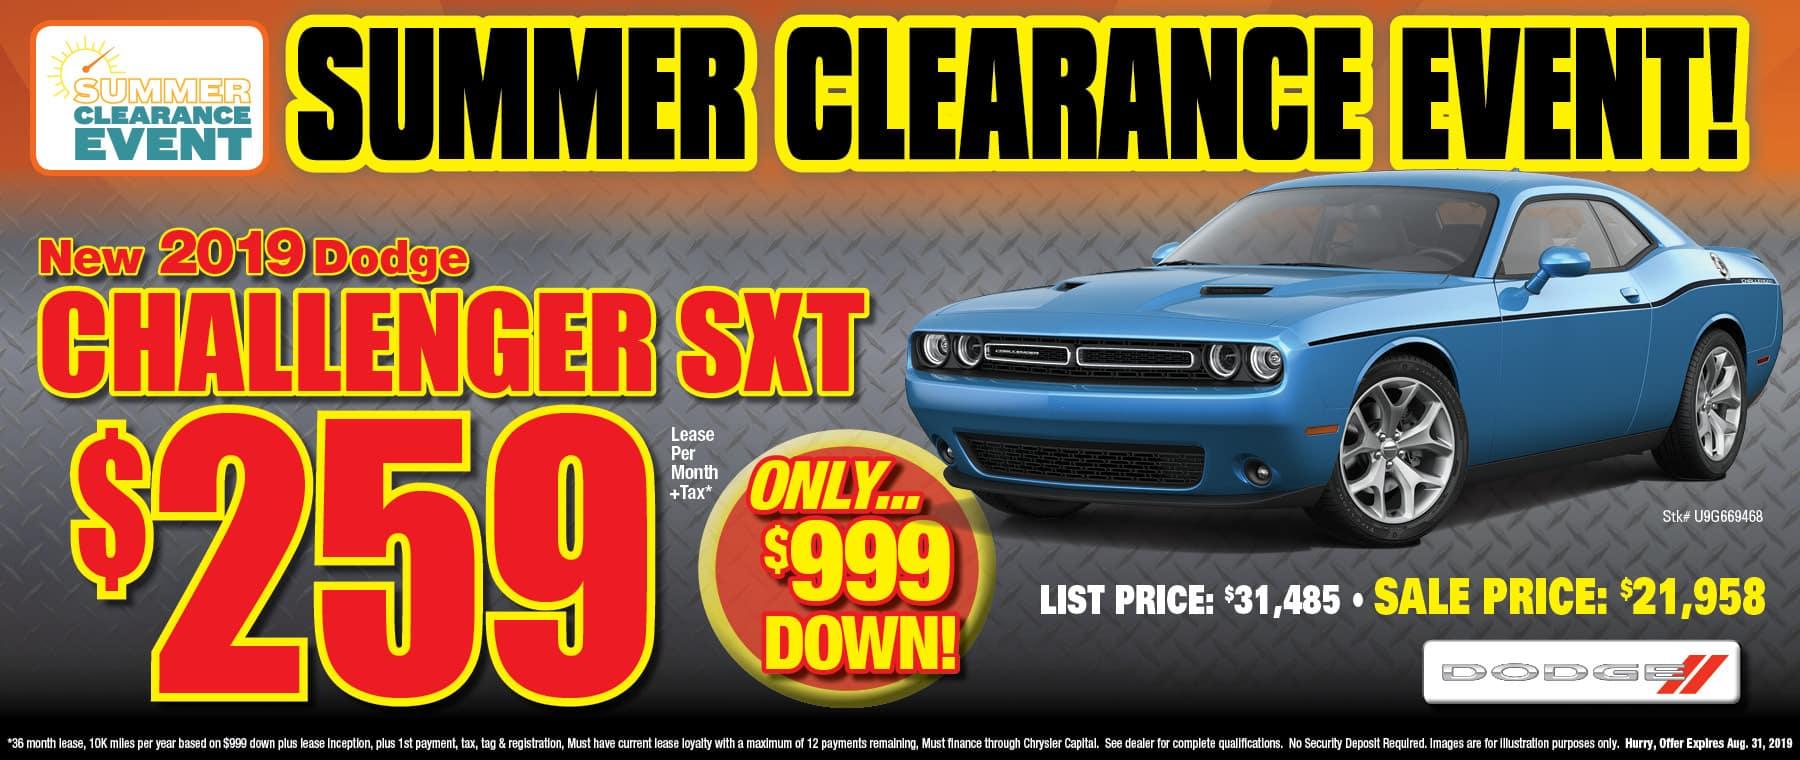 New 2019 Dodge Challenger!